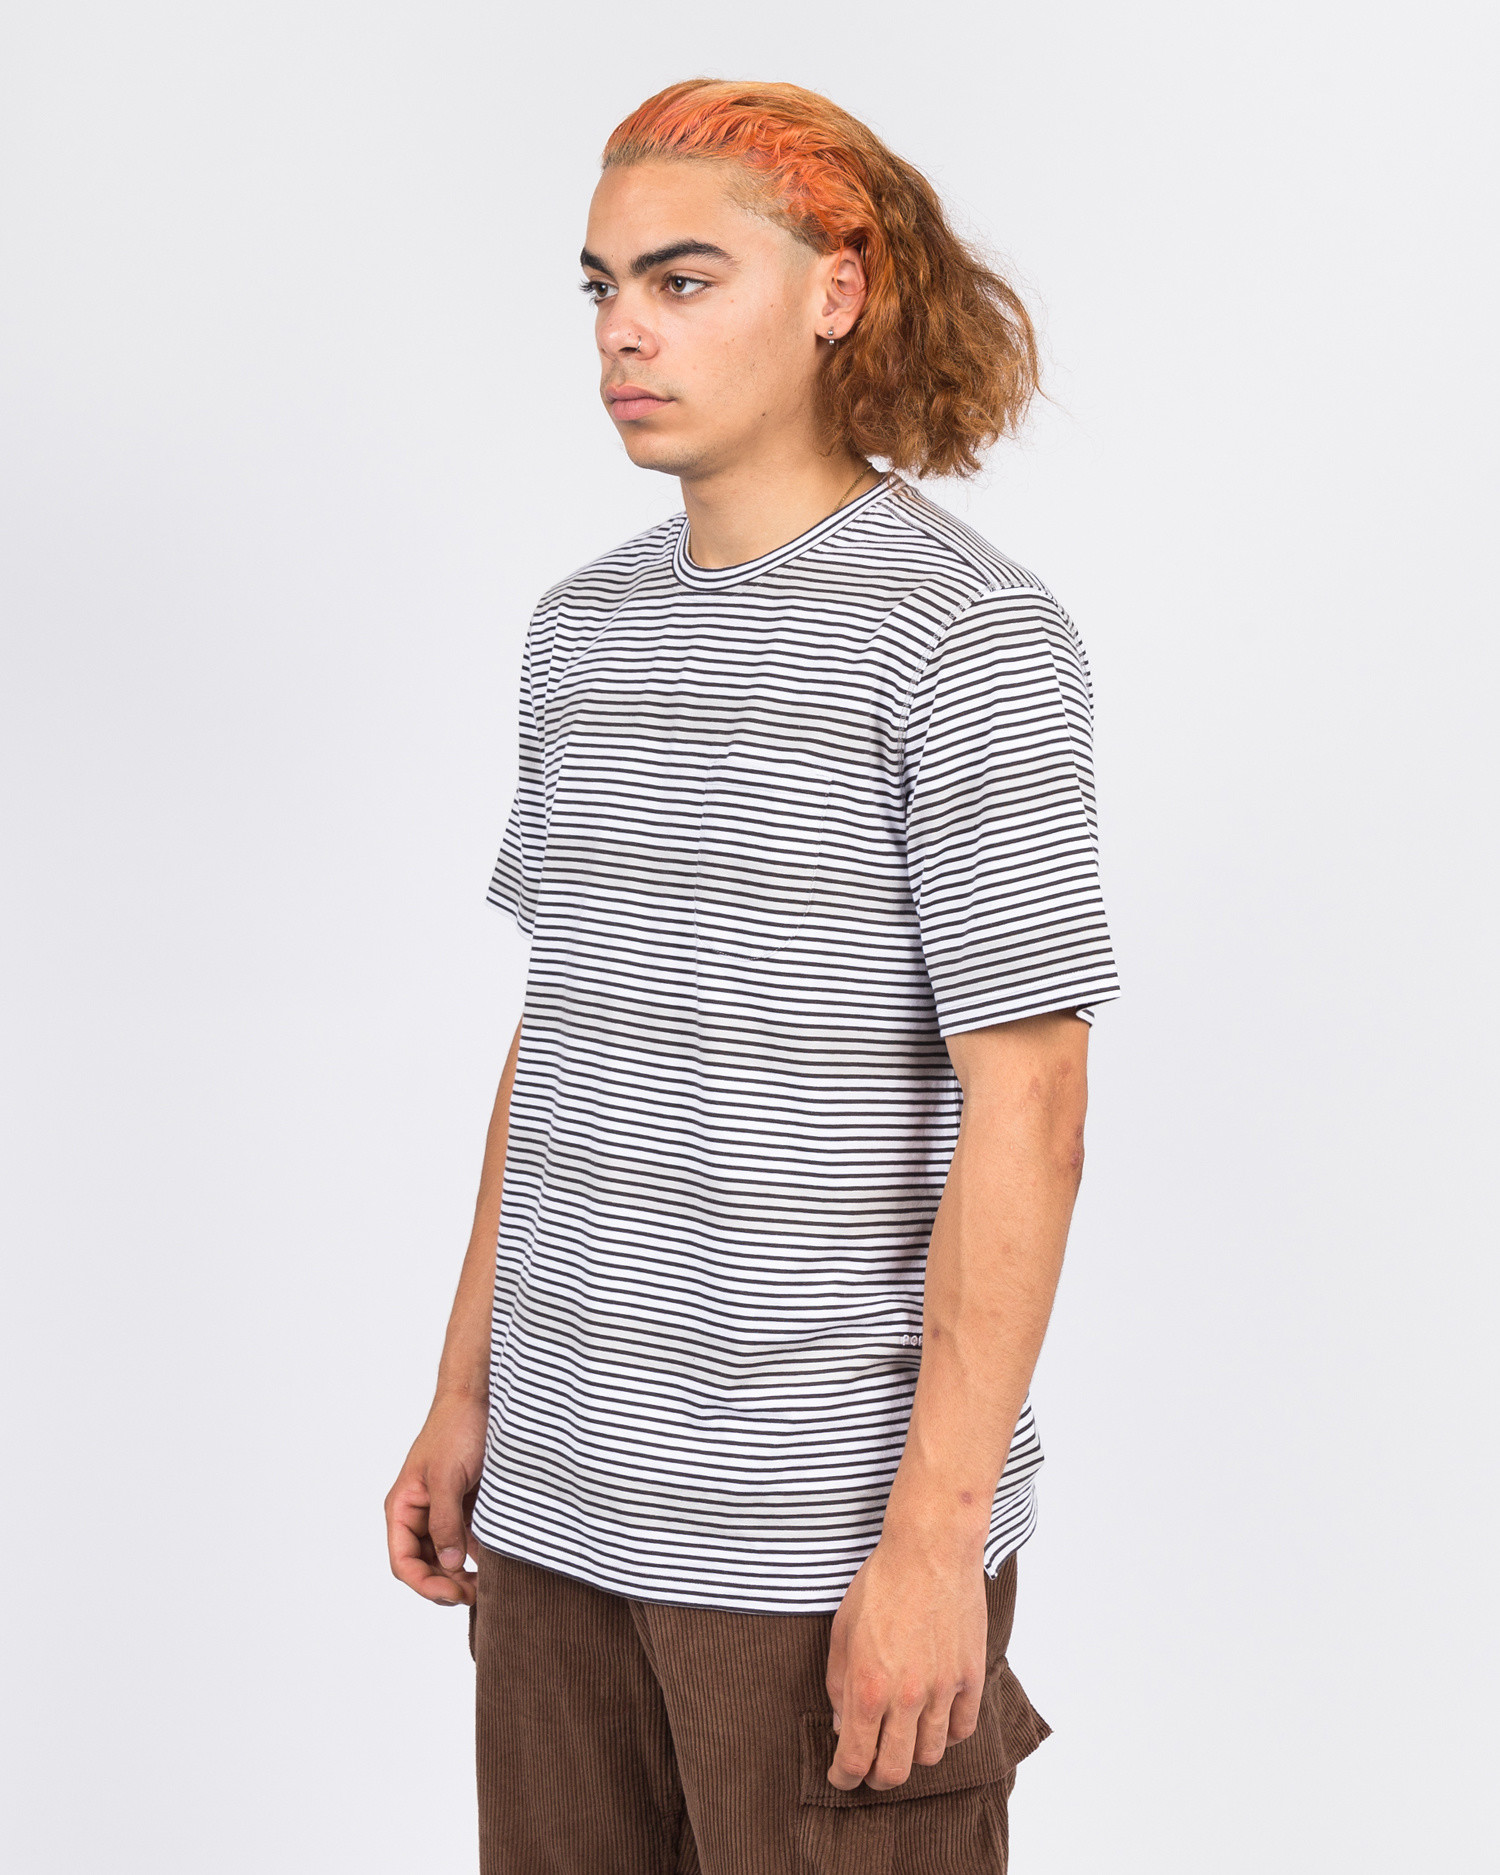 Pop Trading Co harde stripe t-shirt anthracite/white